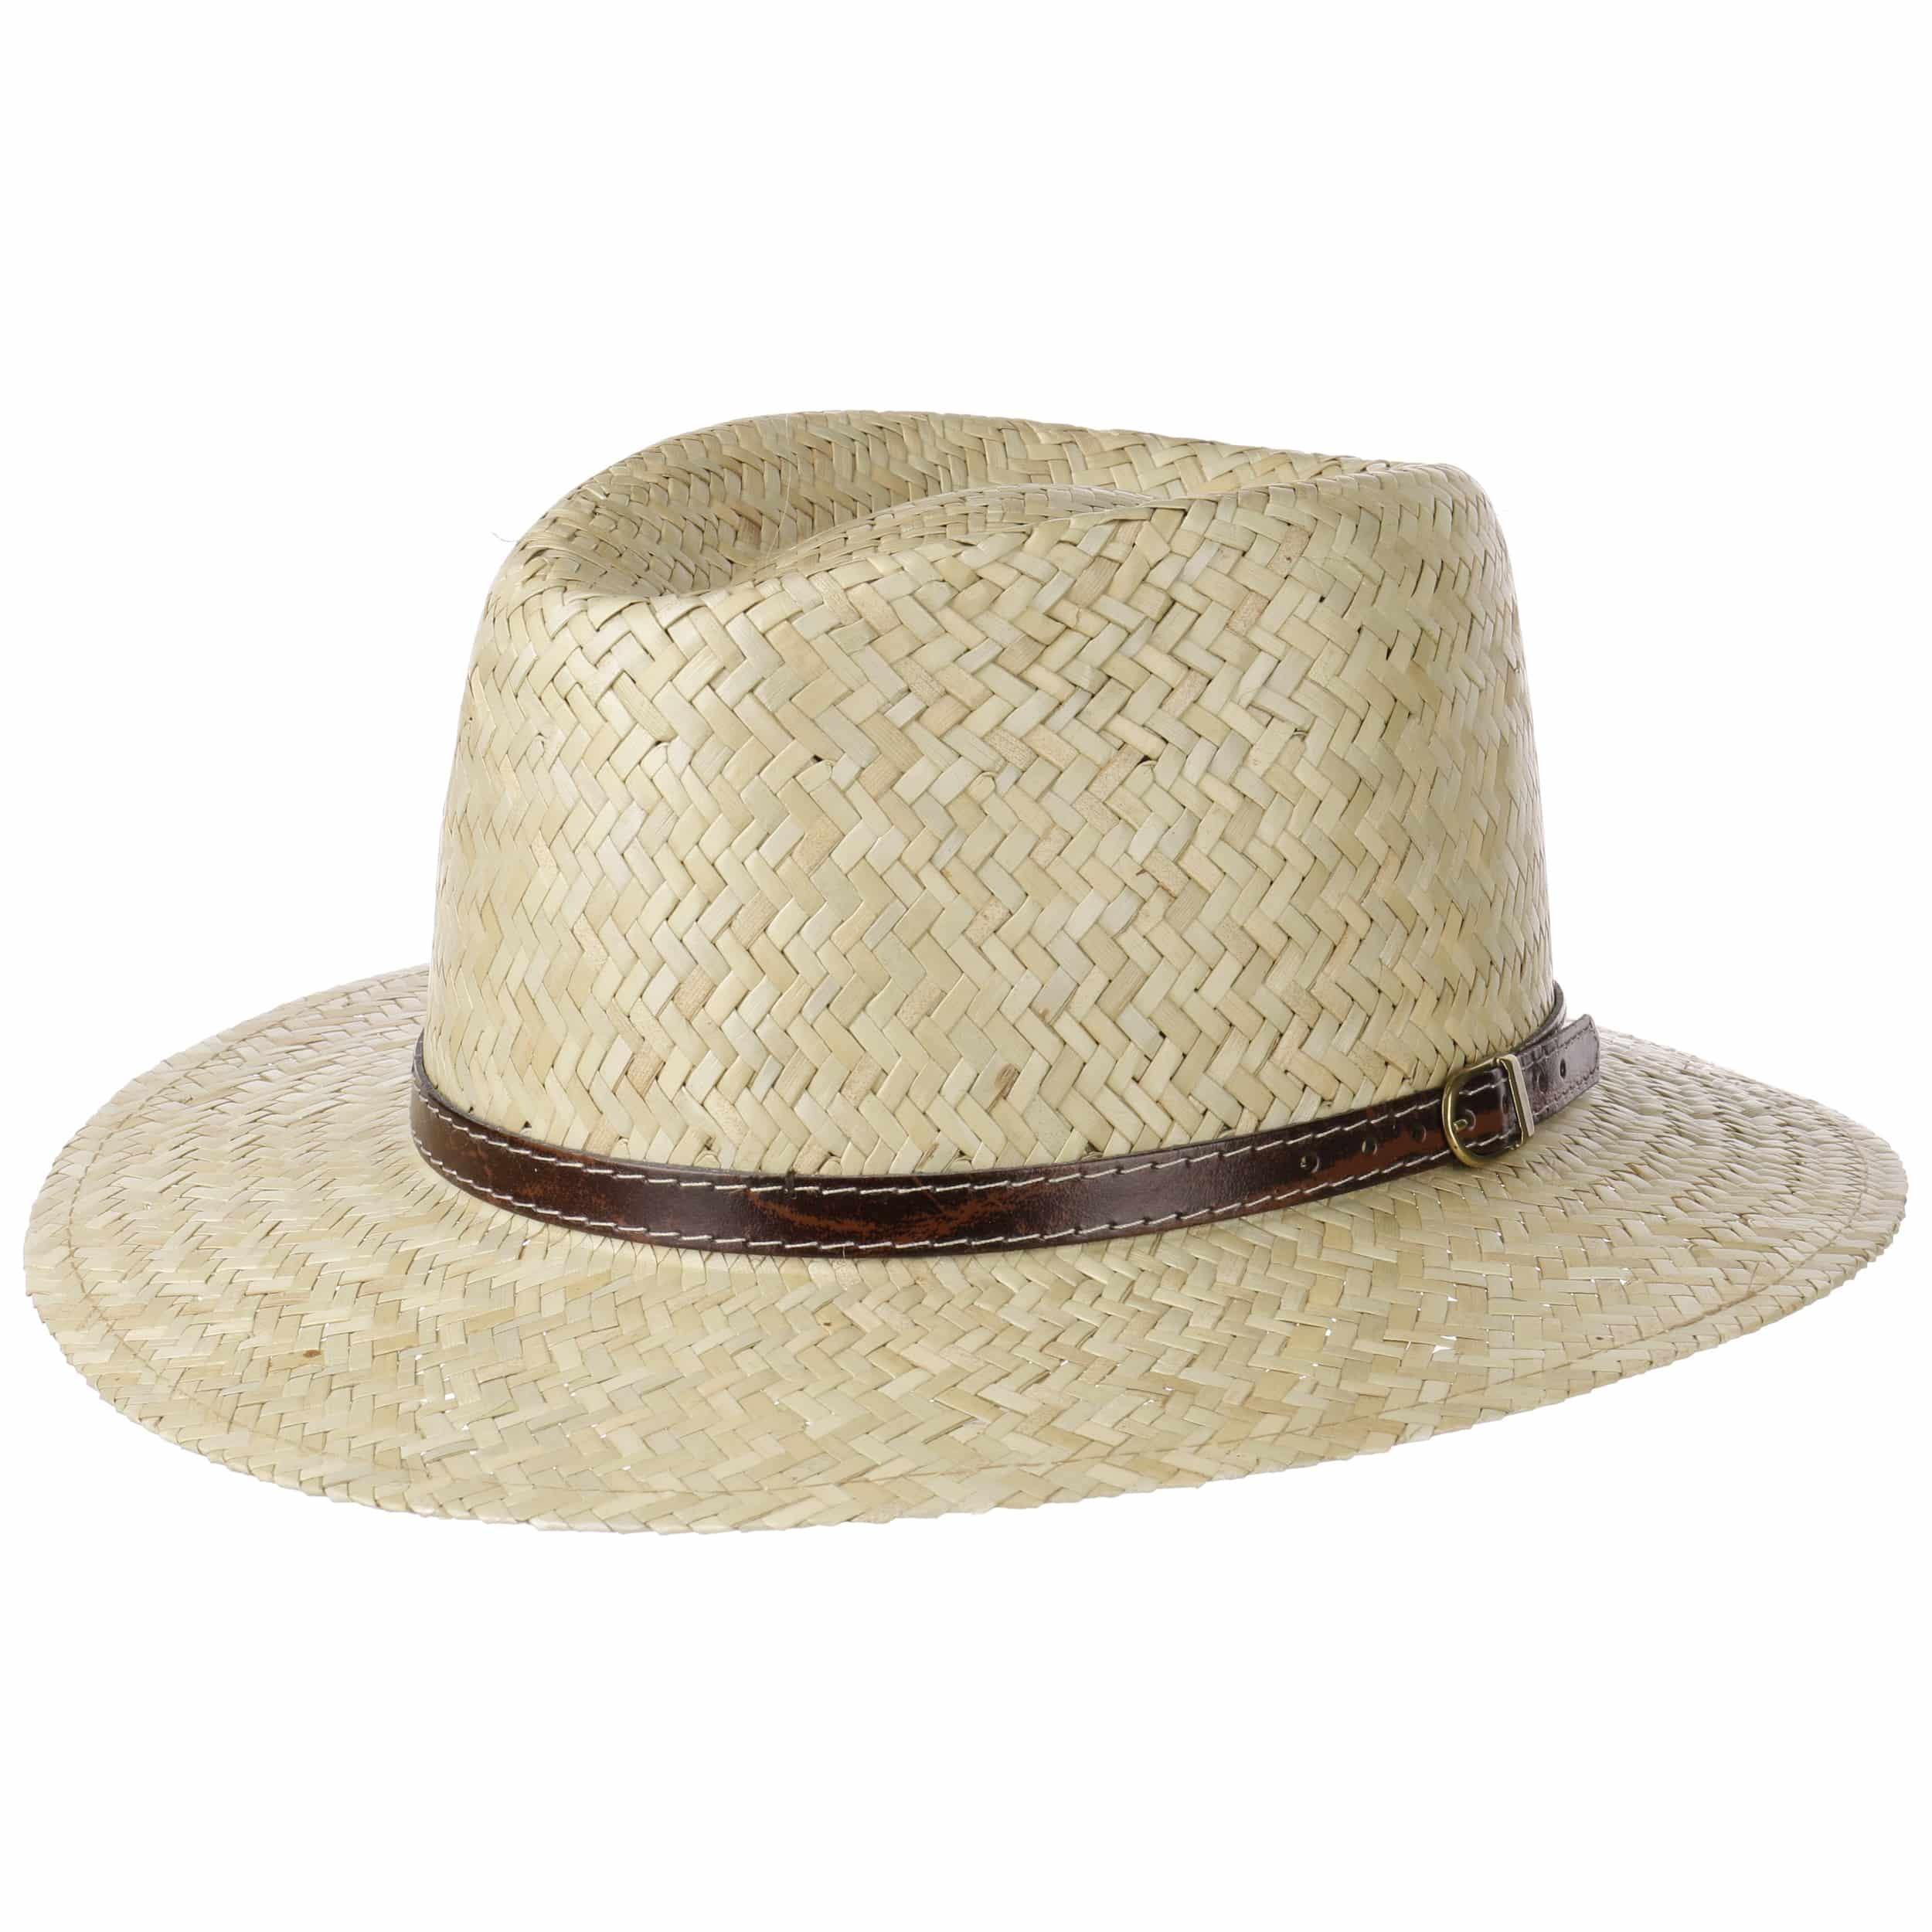 luke men s straw hat eur 19 95 hats caps beanies shop online. Black Bedroom Furniture Sets. Home Design Ideas